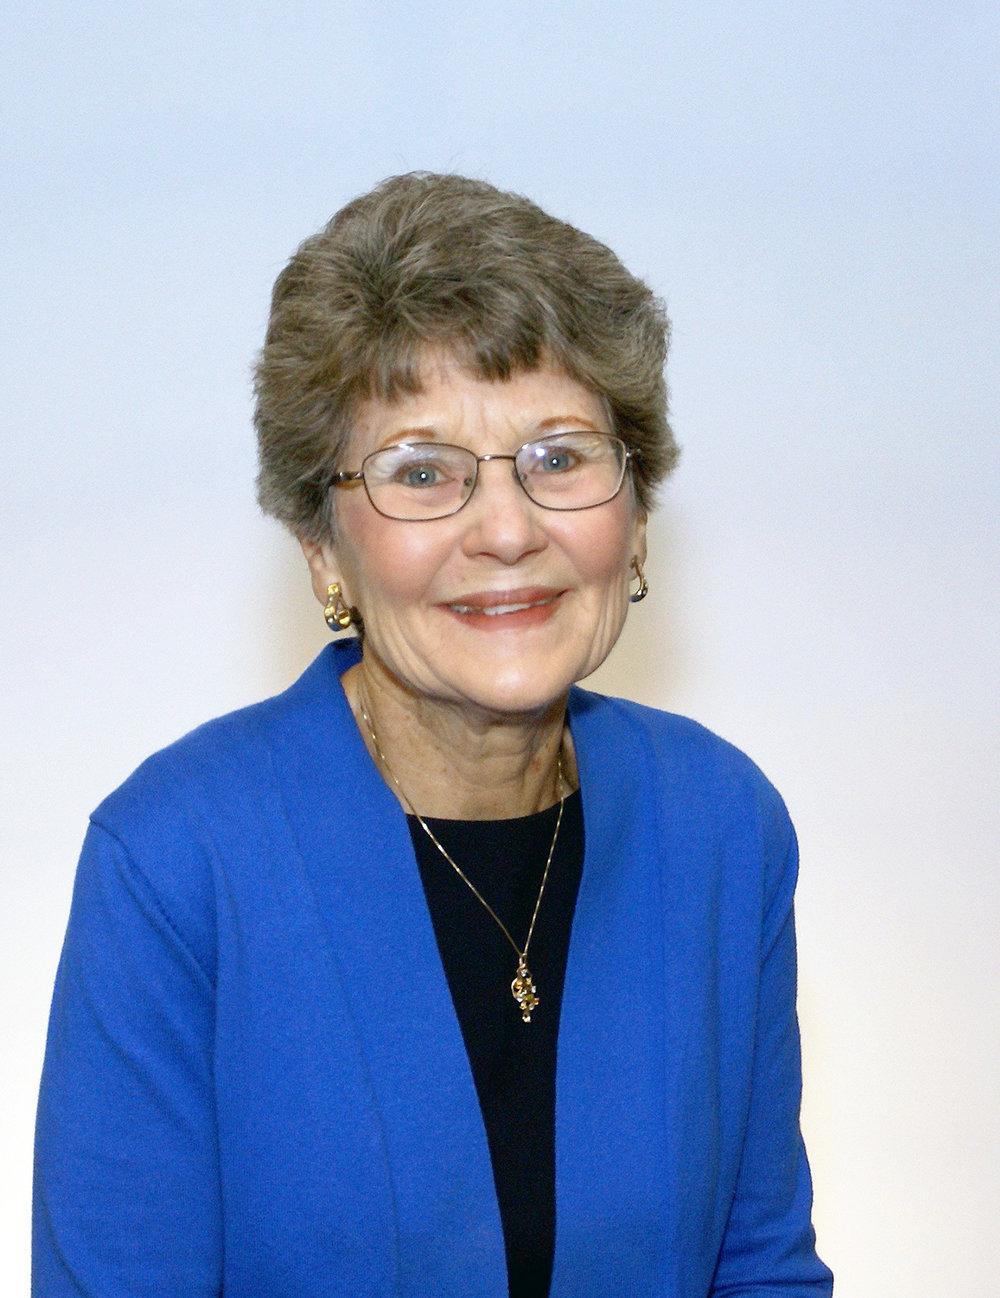 Louise Lindberg - Treasurer